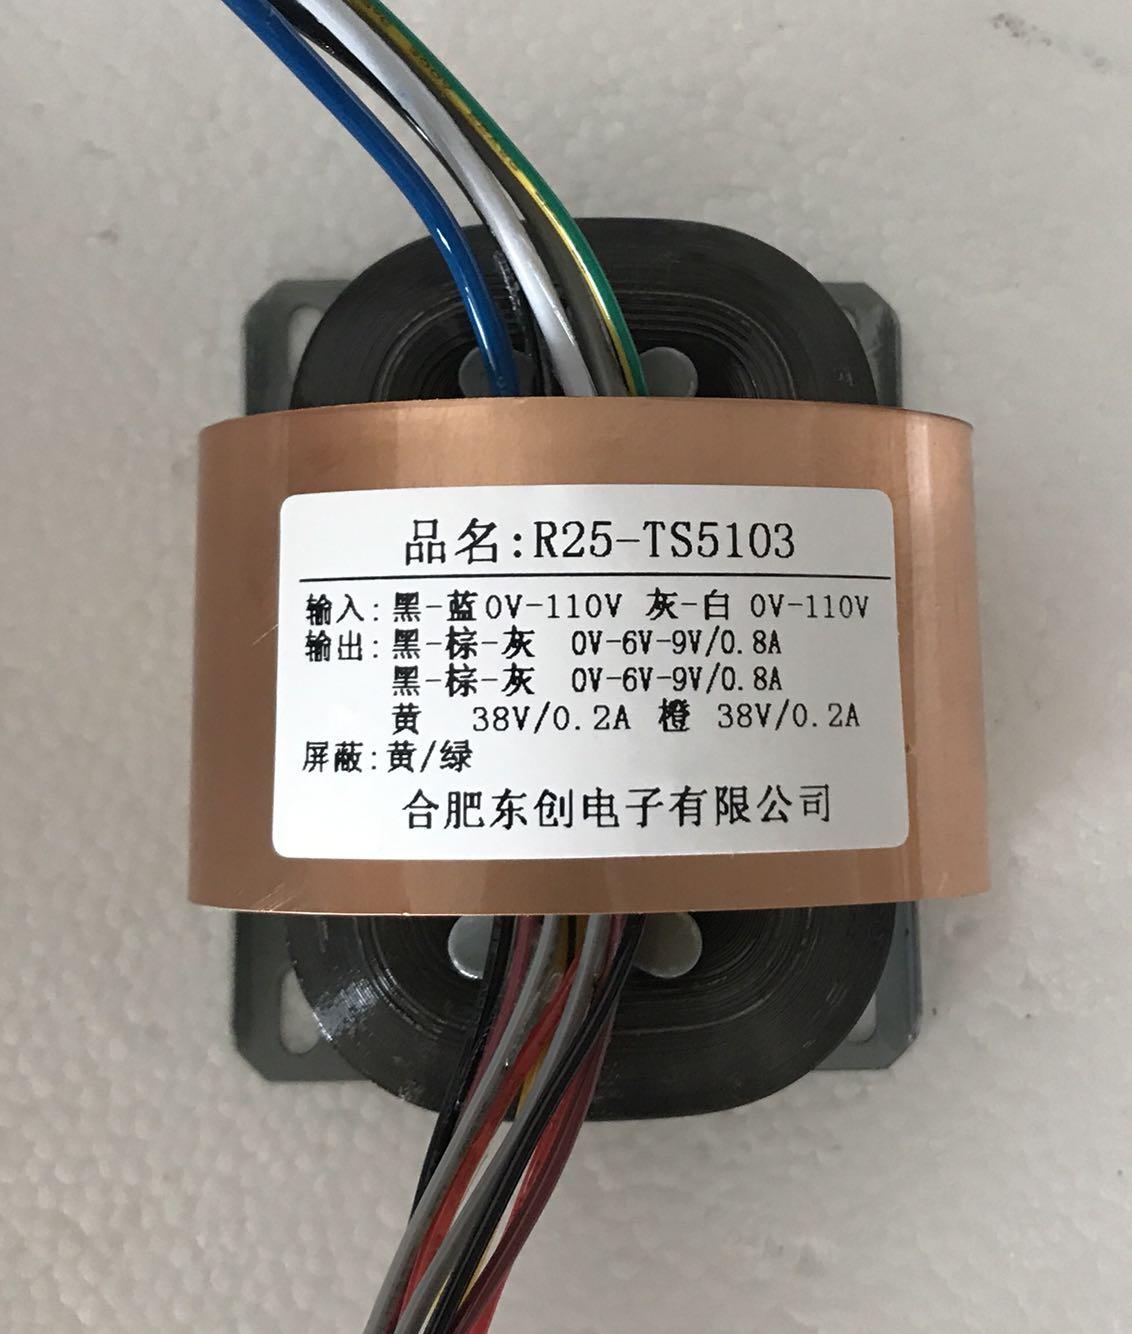 2X0V-6V-9V 0.8A 38V-0V-38V 0.2A R Core Transformer 30VA R25 custom transformer 110V/110V with copper shield for Power amplifier 15v 0v 15v 9v 0v 9v r core transformer 100va r80 custom transformer 220v input with copper shield output for power amplifier